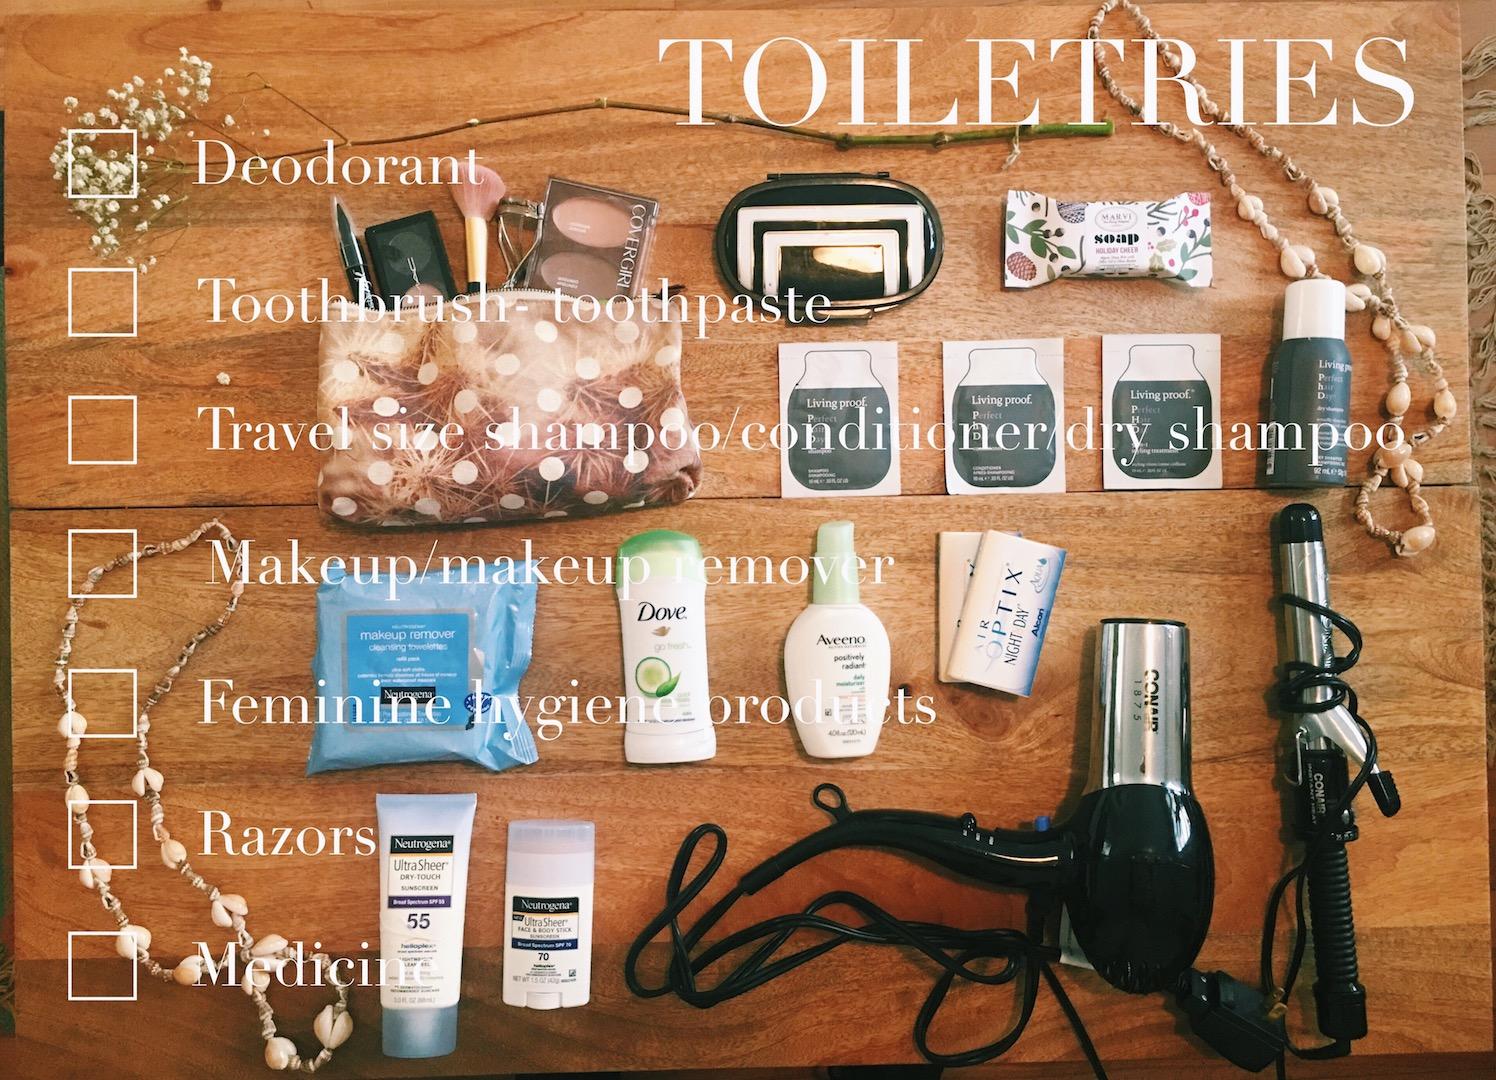 toiletries-travel-packing-checklist